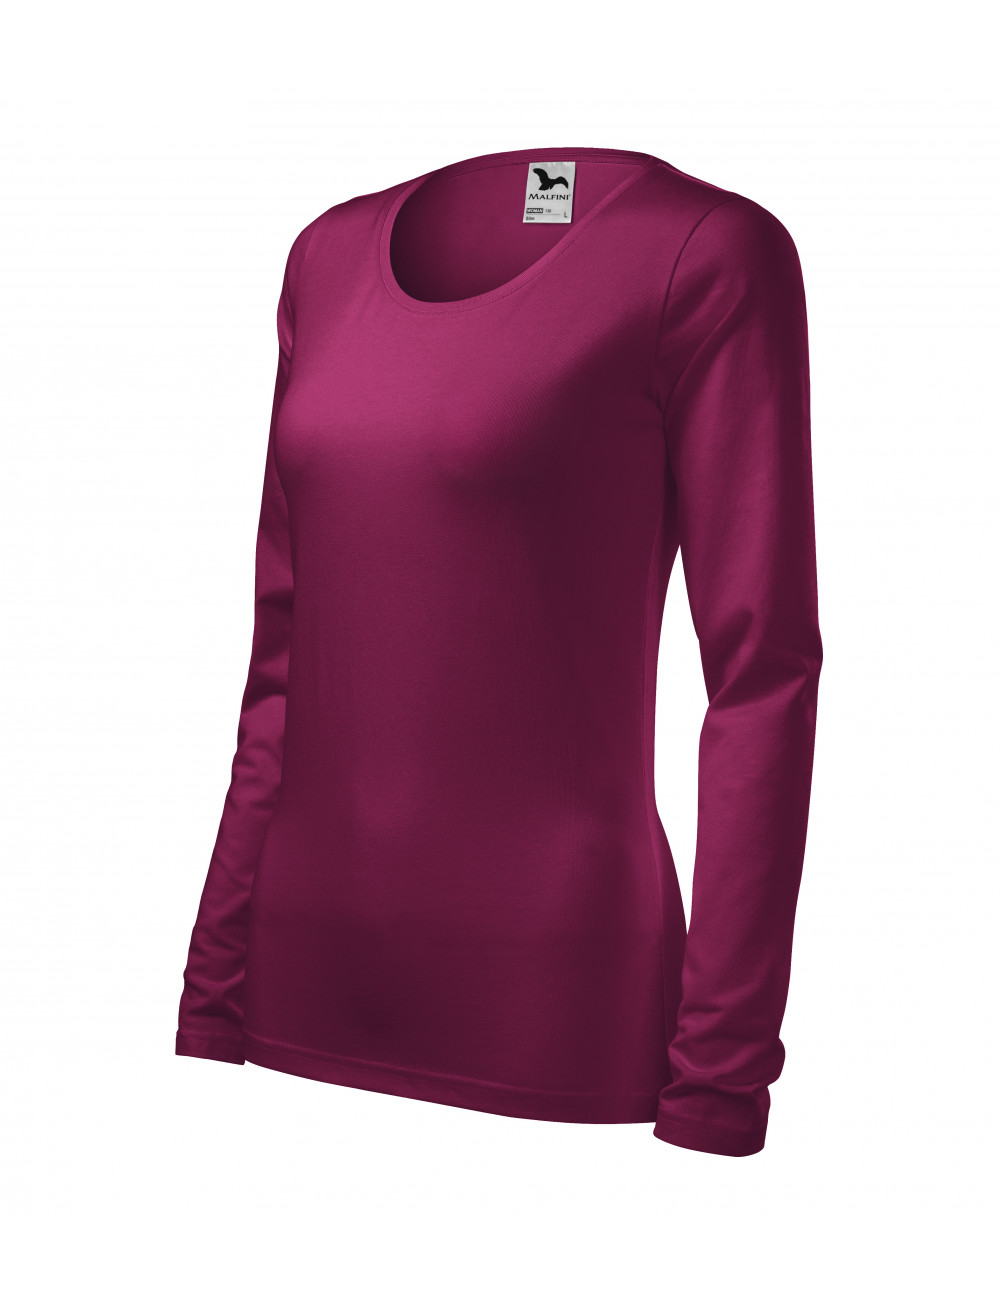 Adler MALFINI Koszulka damska Slim 139 uksjowy